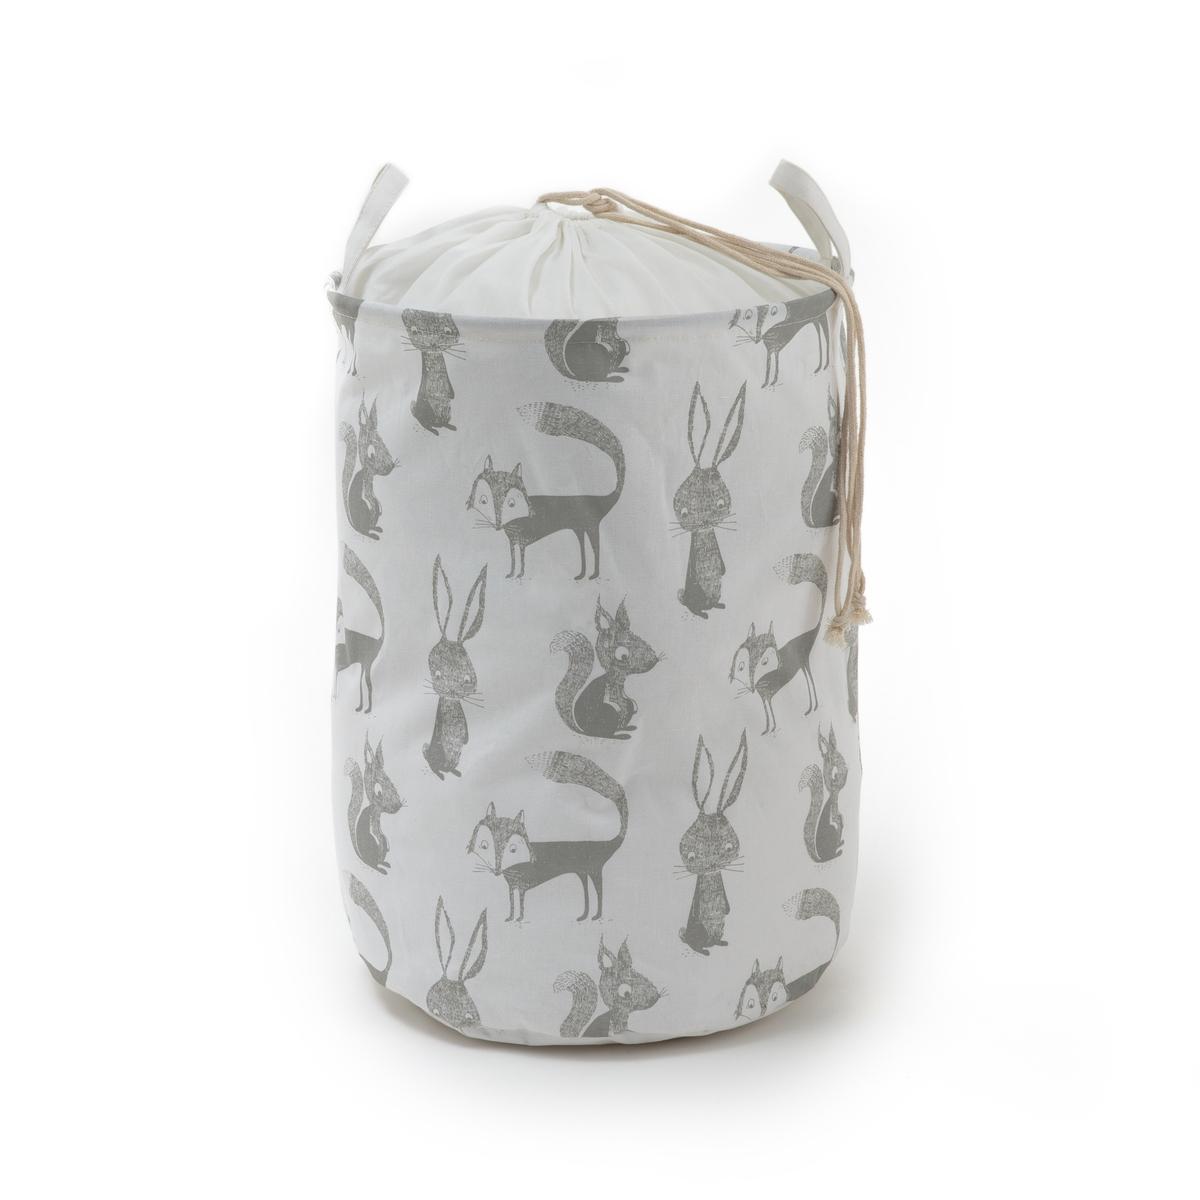 Корзина для хранения NIMALI reisenthel корзина для хранения ovalbasket s black